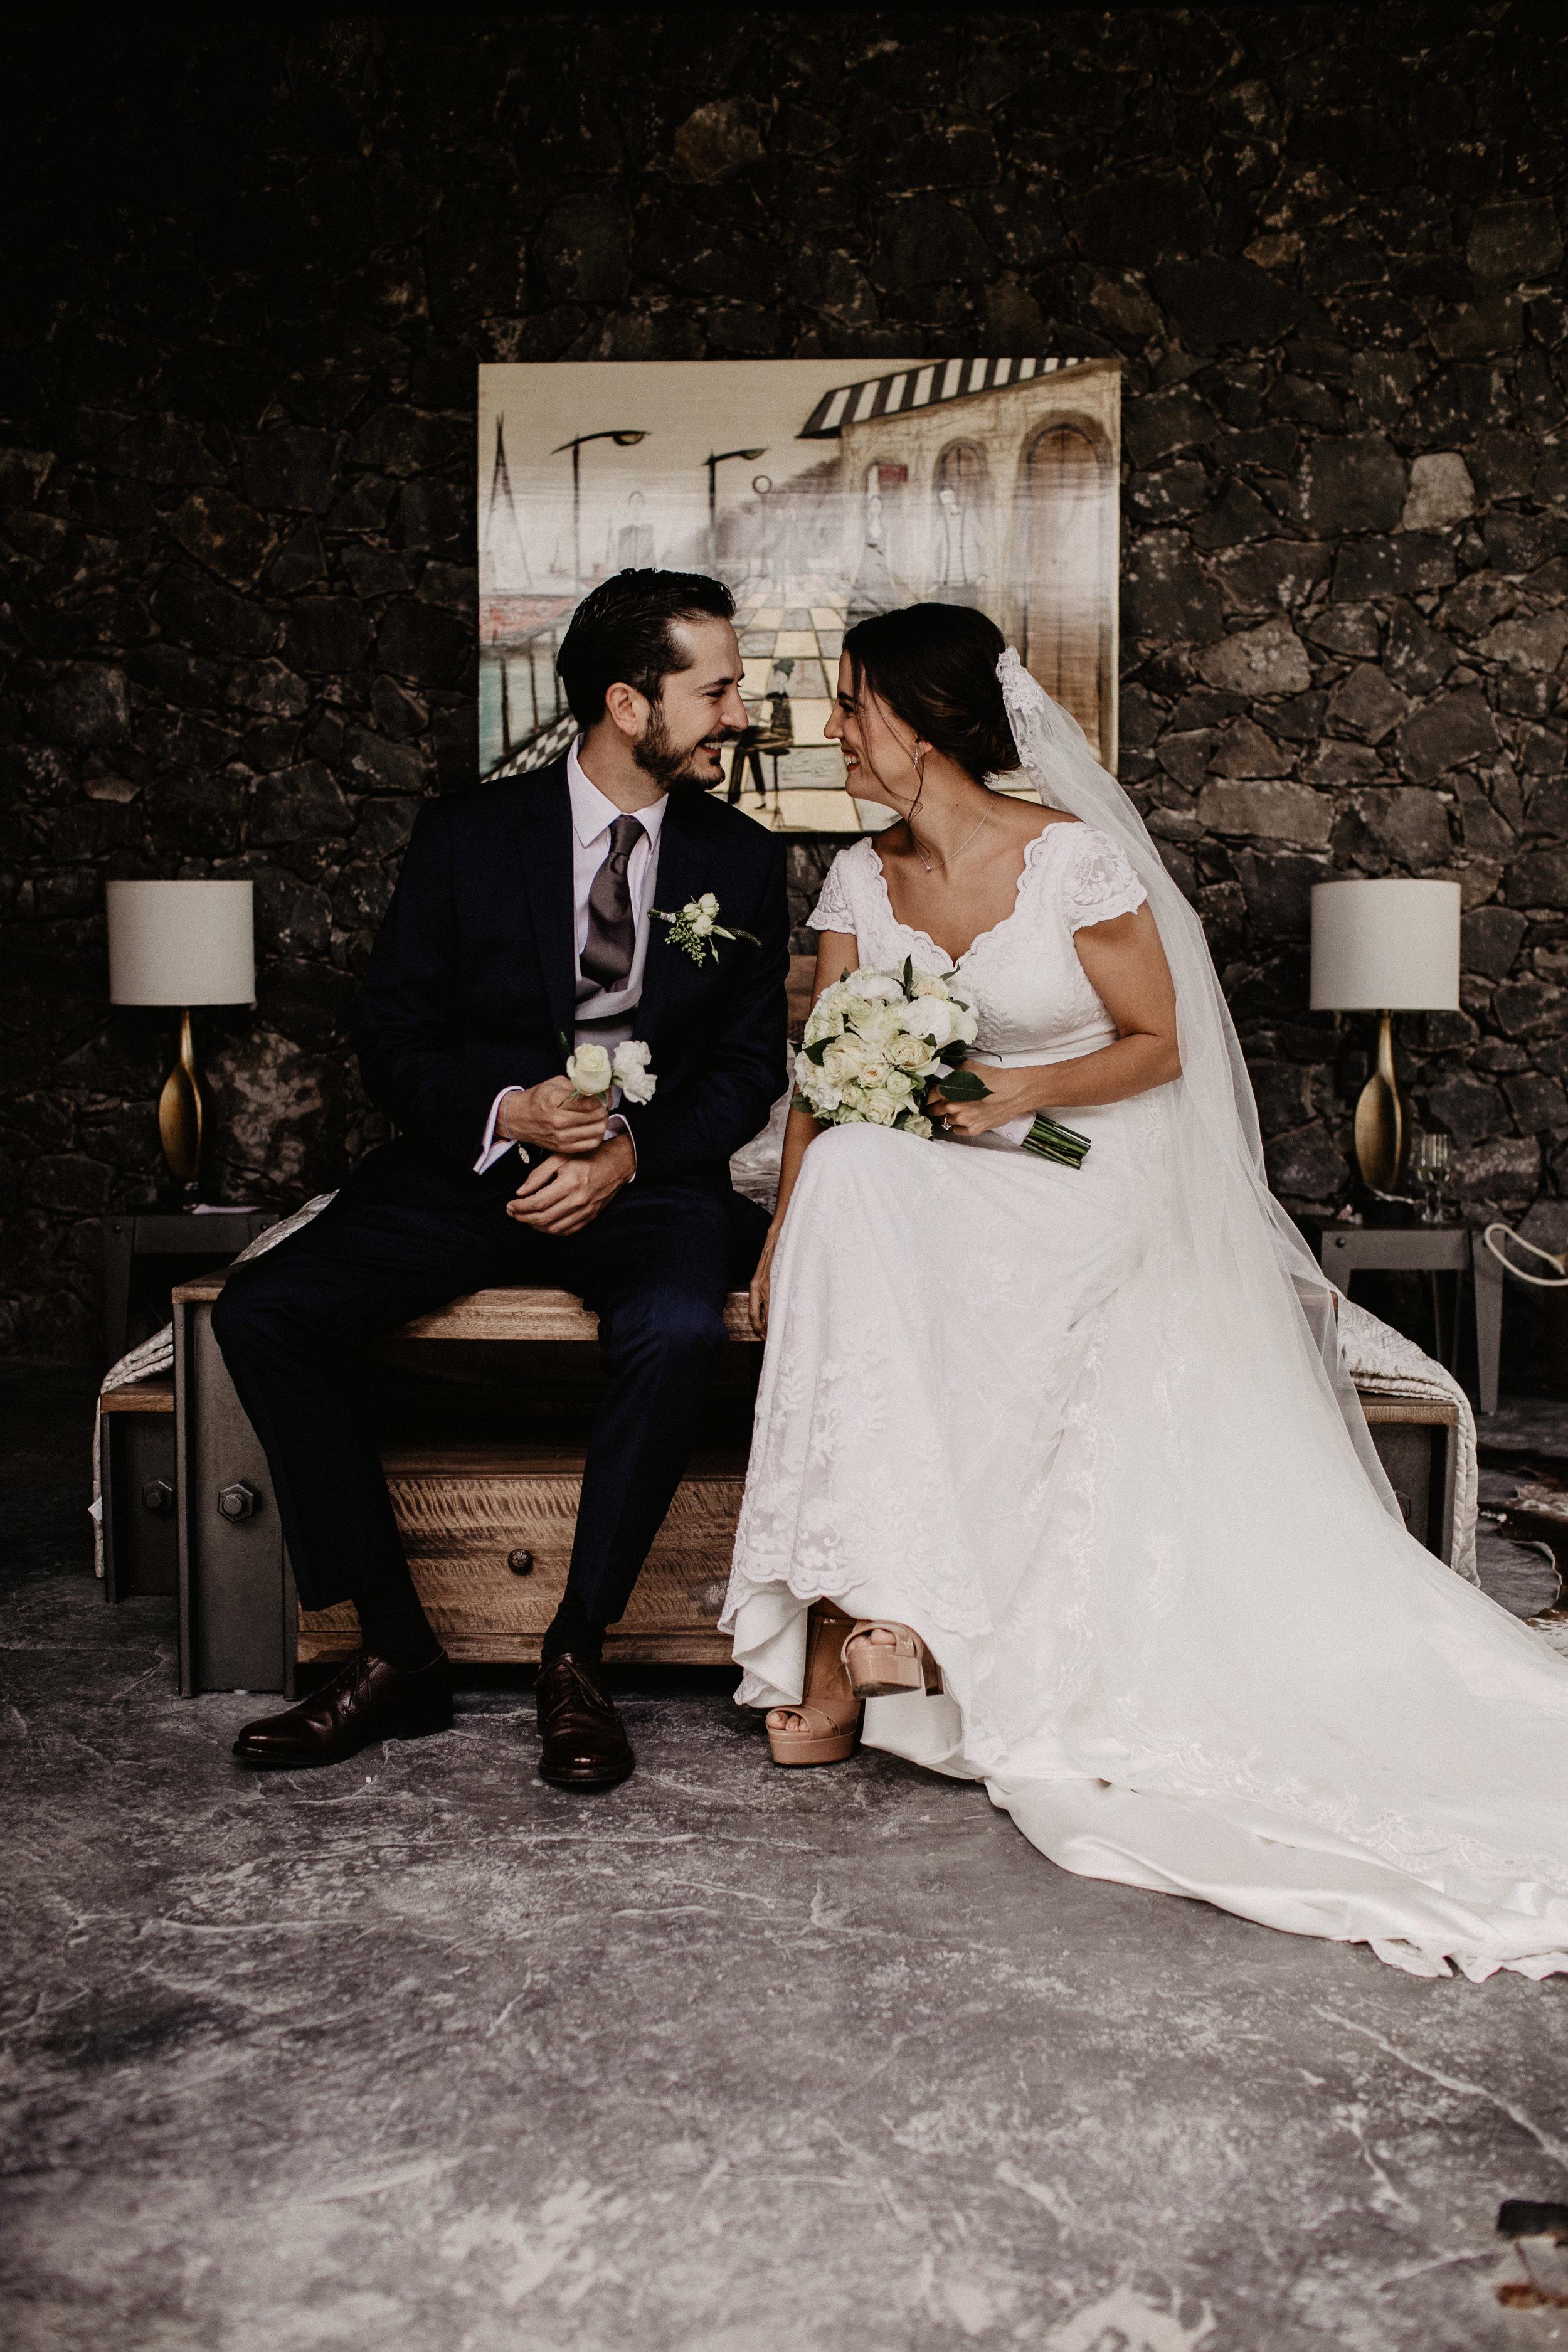 alfonso_flores_destination_wedding_photographer_pau_alonso_264.JPG